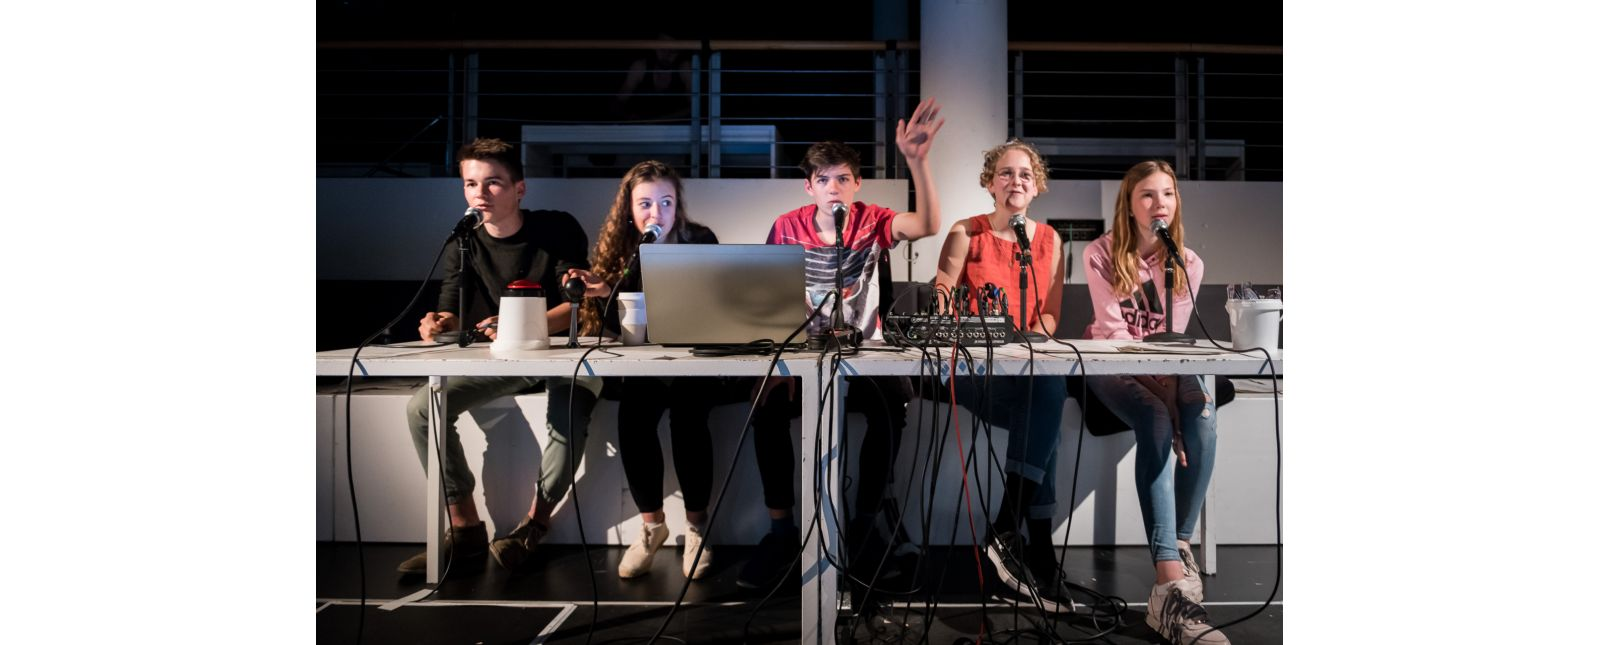 Das Leben des Anderen // Timon Roosen / Malika Scheller / Noah Menzinger / Teresa Jägle / Charlotte Wunderlich // 2019 // Foto: Marc Doradzillo